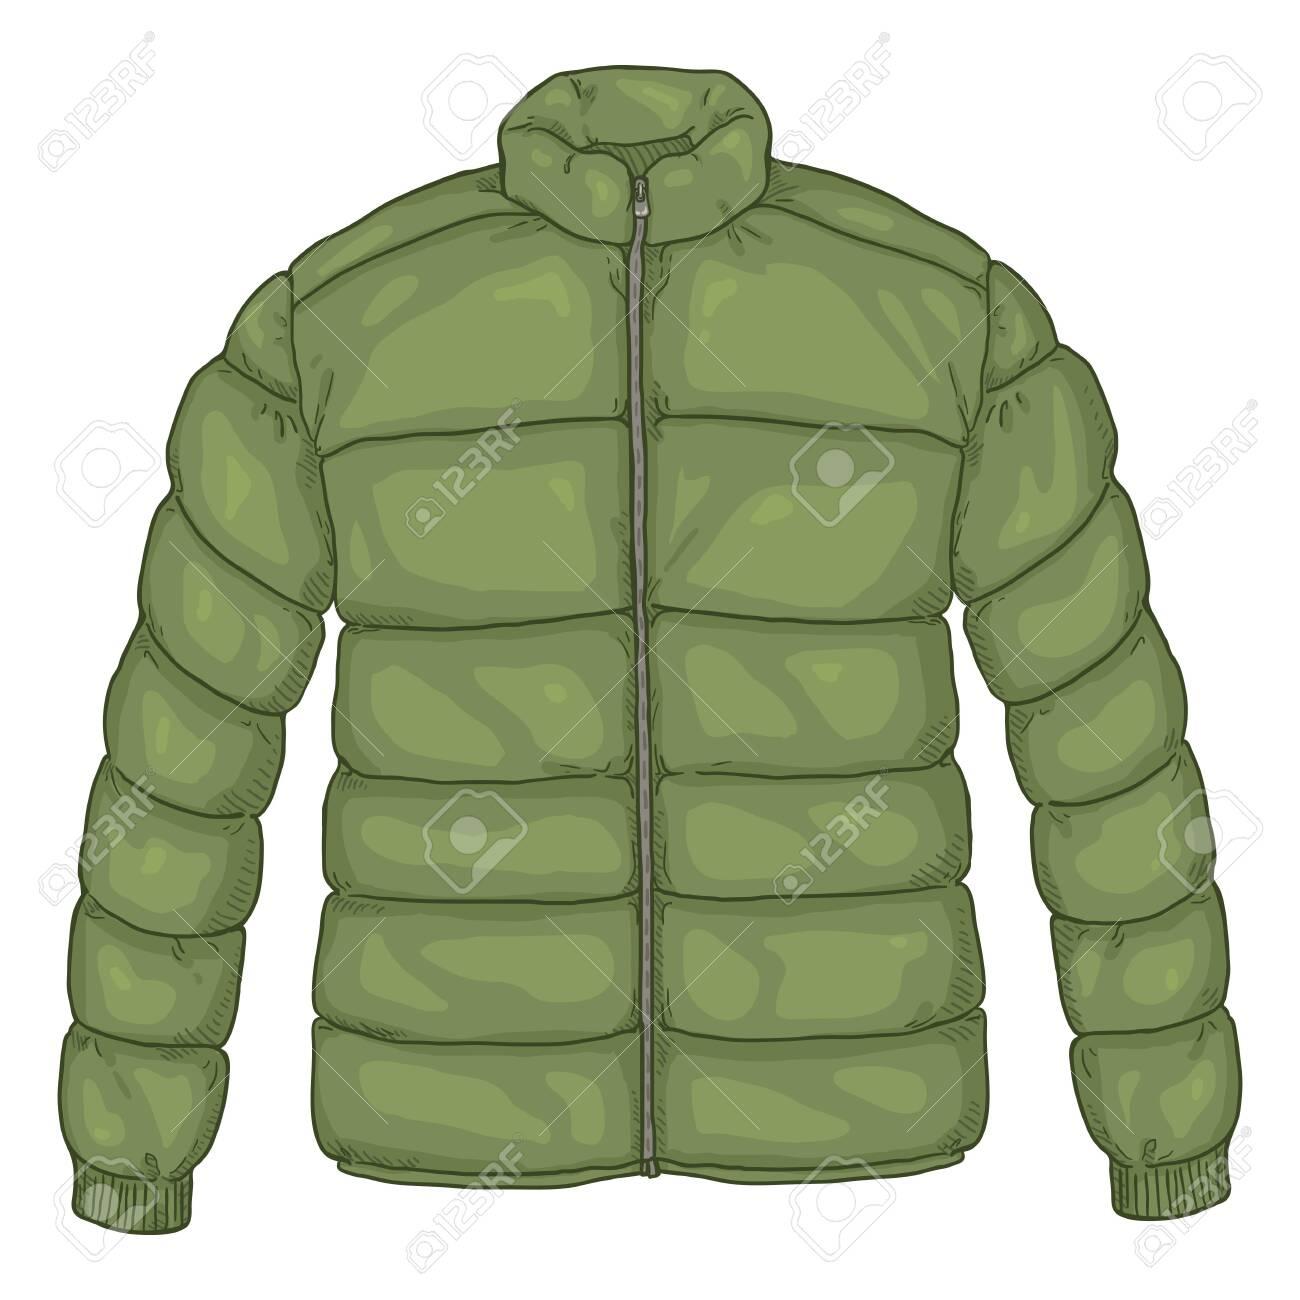 Vector Cartoon Khaki Down Jacket Illustration - 130400004